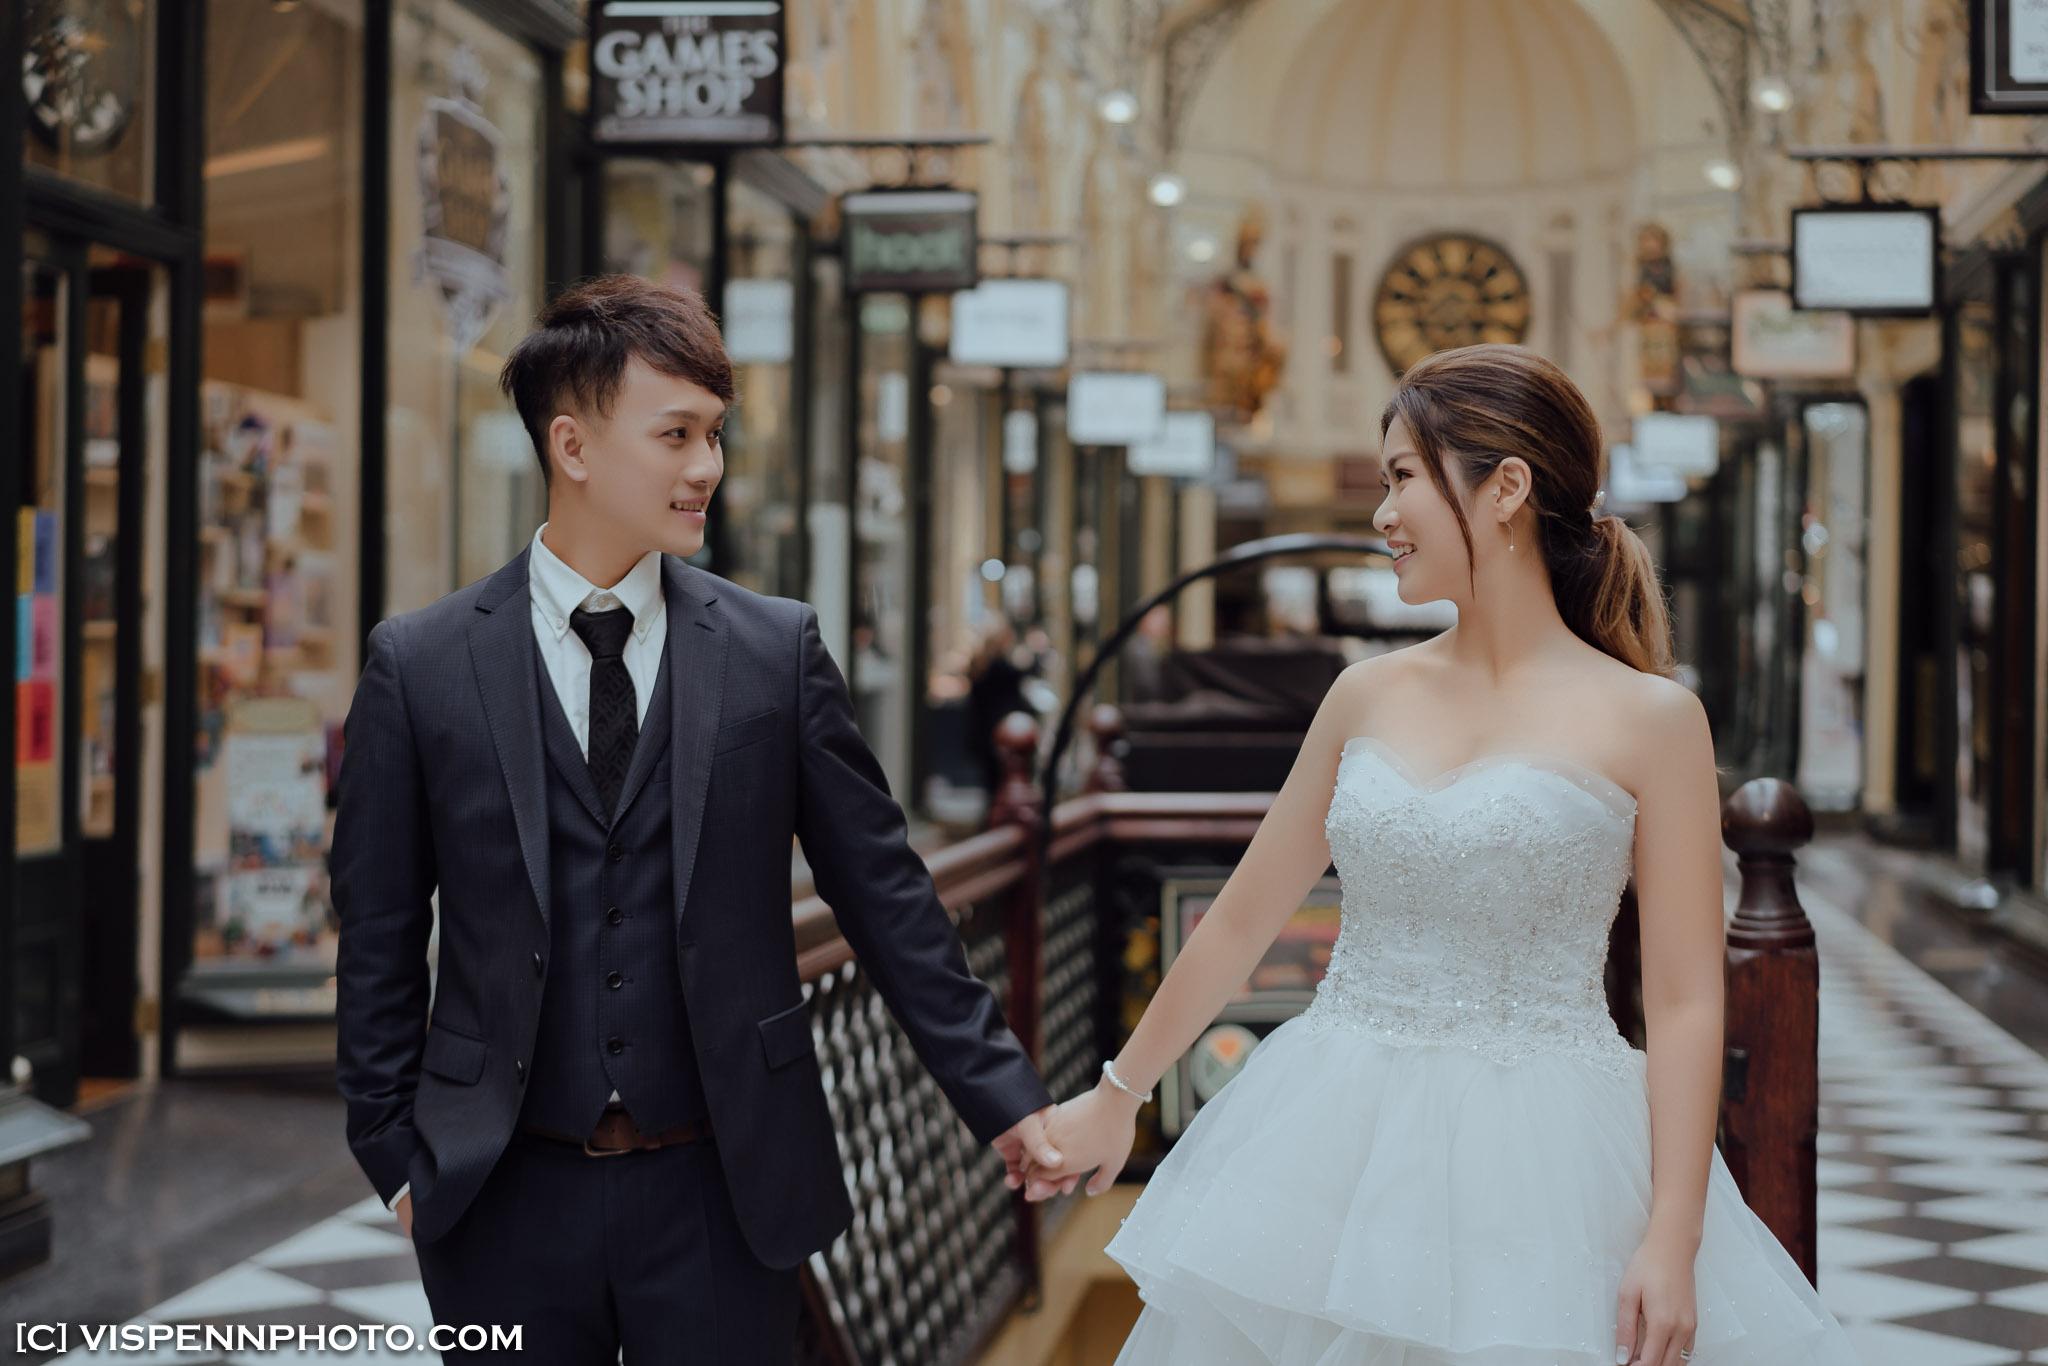 PRE WEDDING Photography Melbourne VISPENN 墨尔本 婚纱照 结婚照 婚纱摄影 GiGi 2046 A7R3 VISPENN